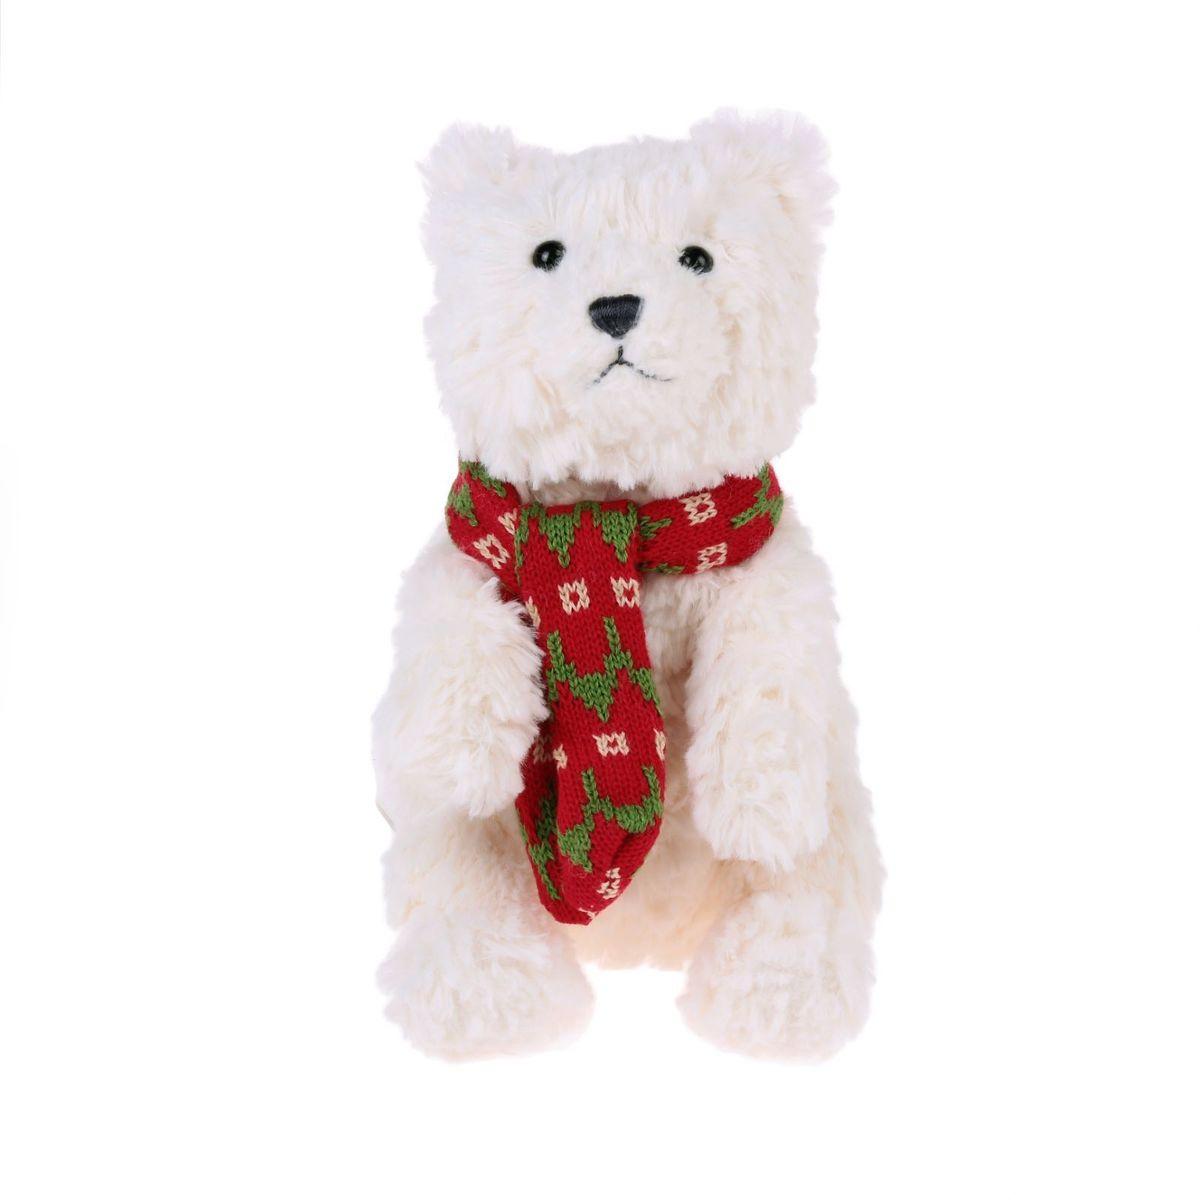 Gund Мягкая игрушка Медведь полярный Bluster Small 30,5 см 2245496 gund мягкая игрушка velvetino с зеленым шарфом 30 5 см